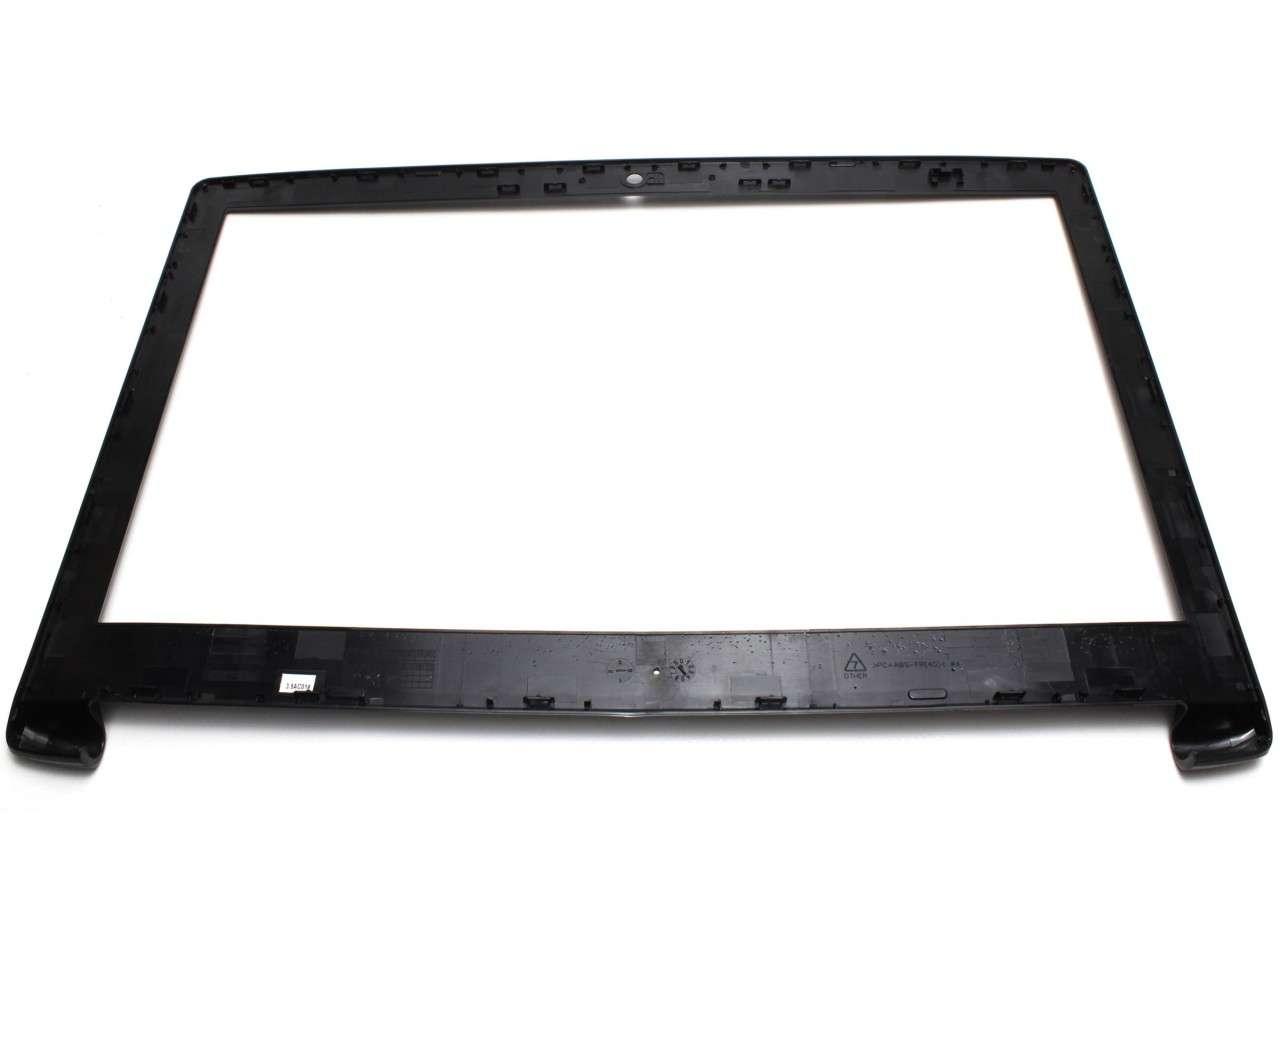 Rama Display Acer Aspire A515-51G Bezel Front Cover Neagra imagine powerlaptop.ro 2021